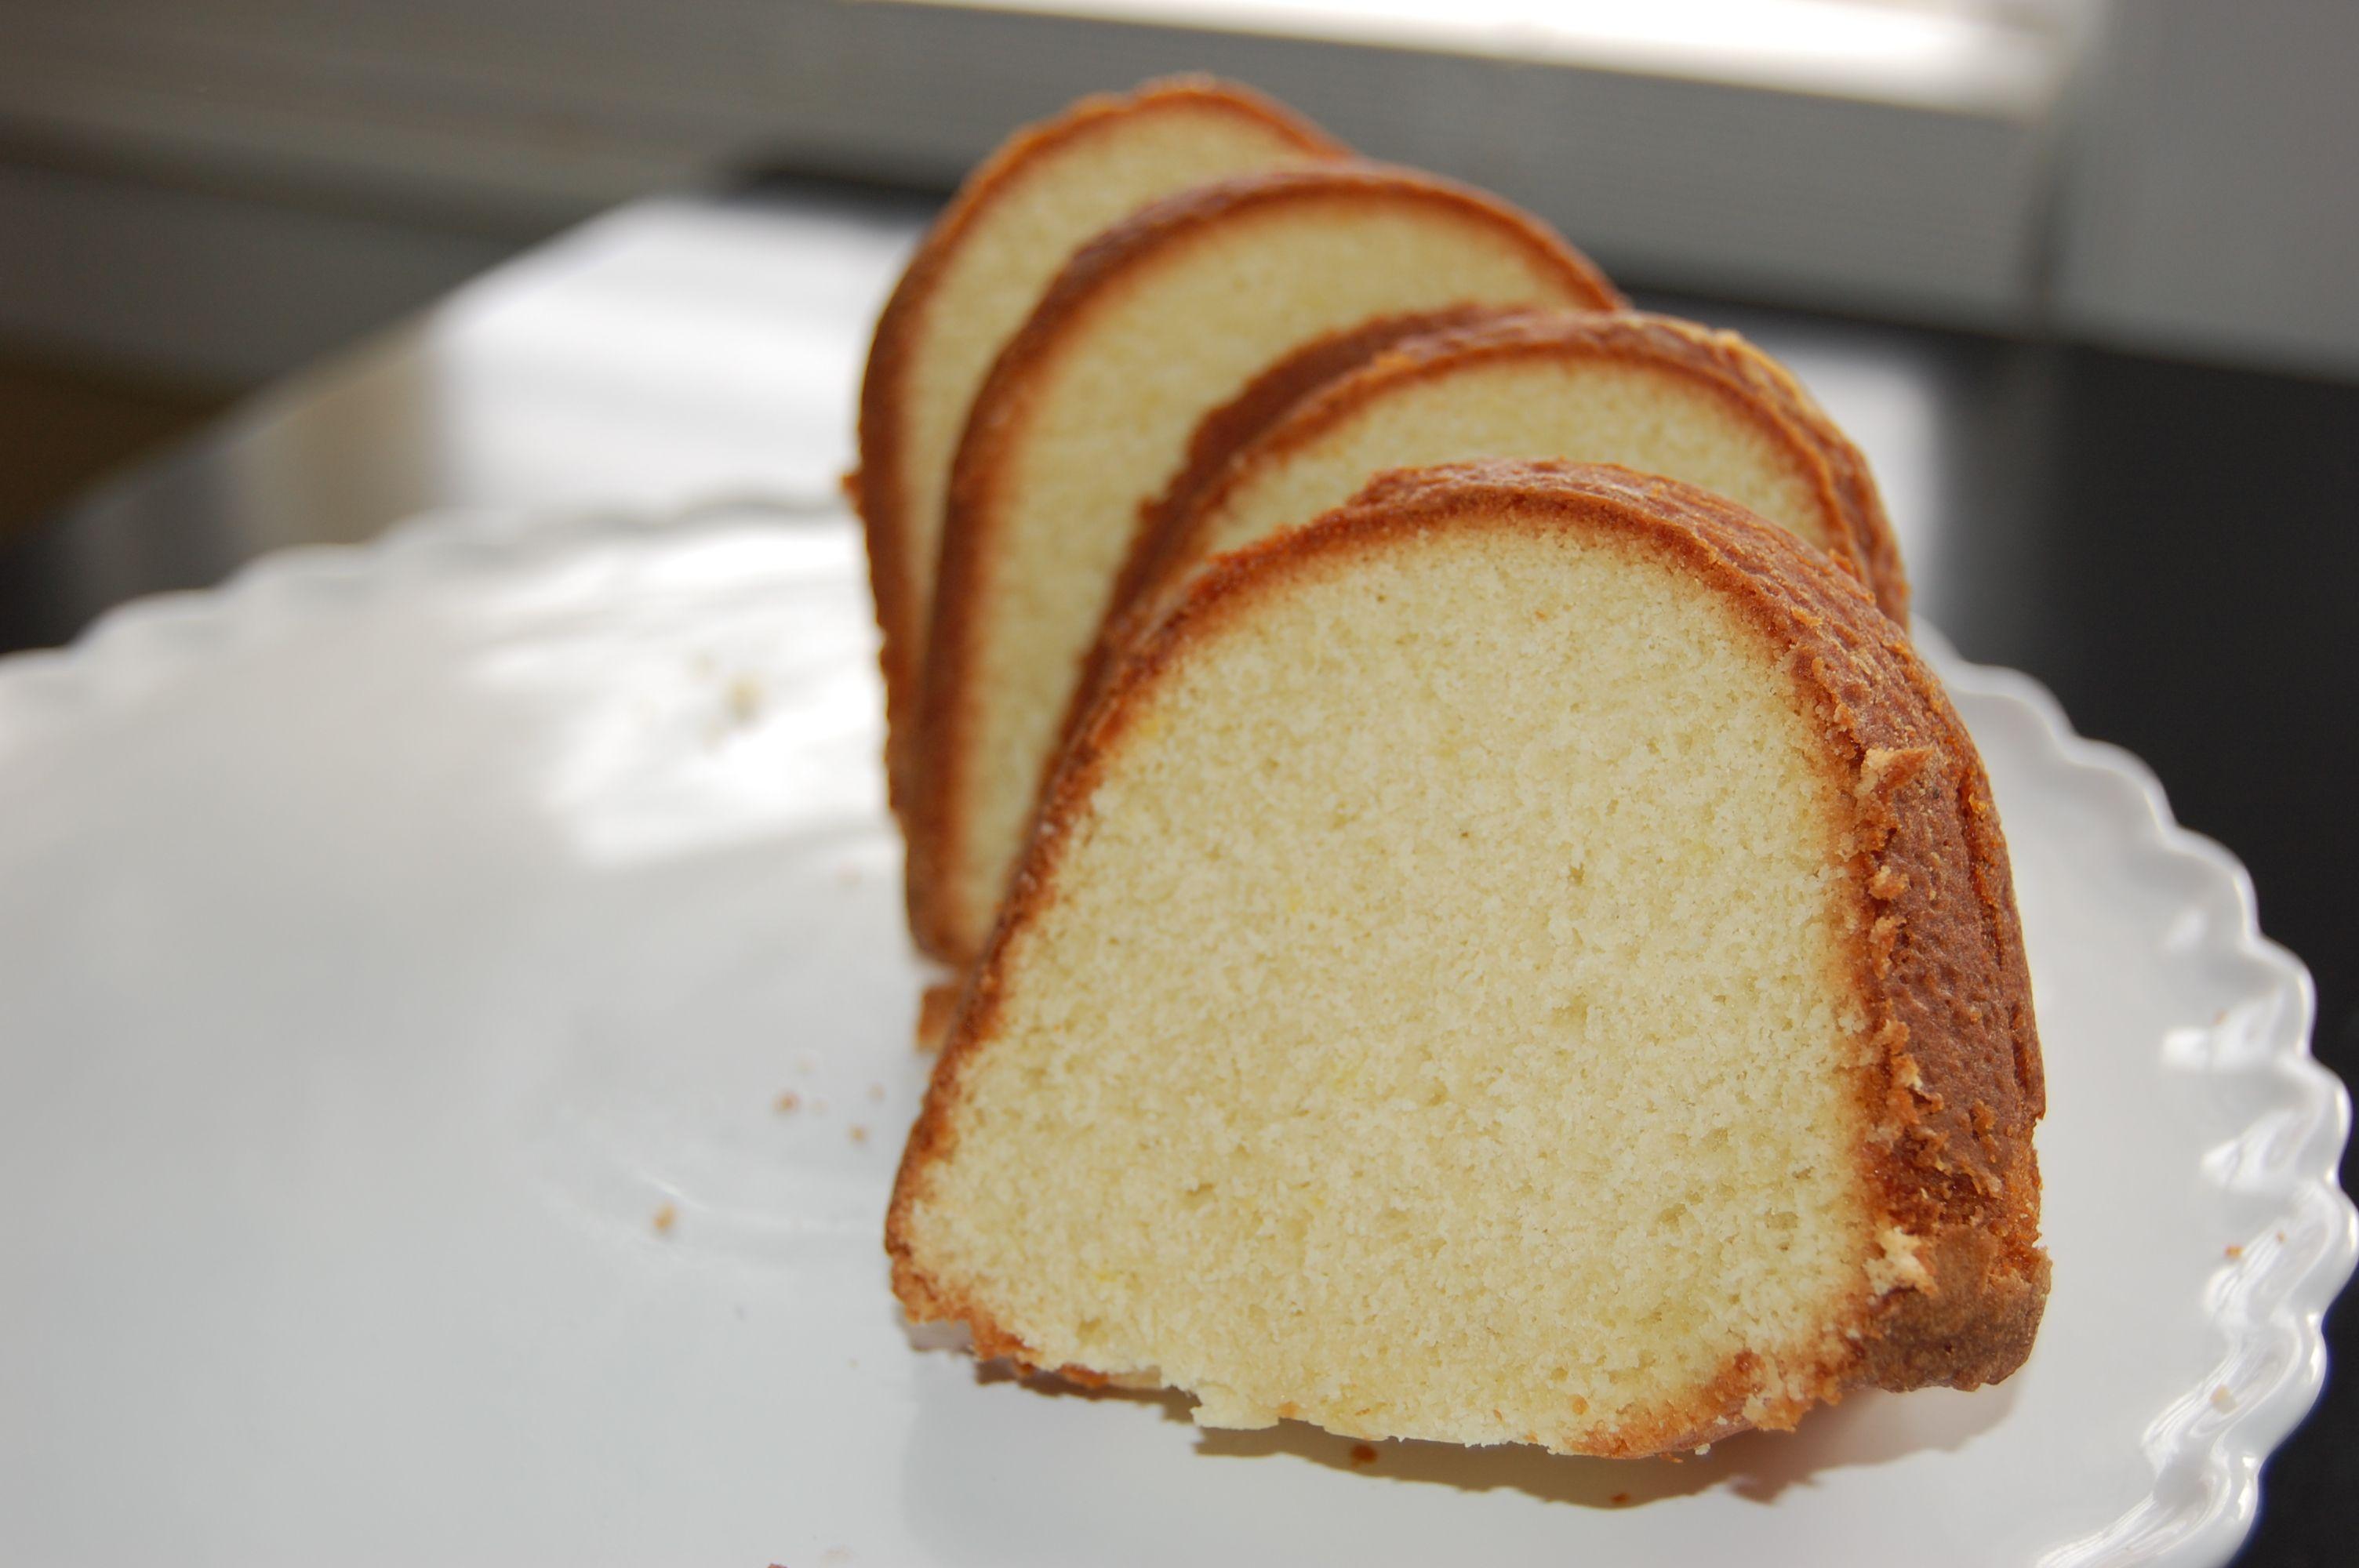 Lemon and vanilla bundt cake made with club soda for my stomach lemon and vanilla bundt cake made with club soda forumfinder Image collections